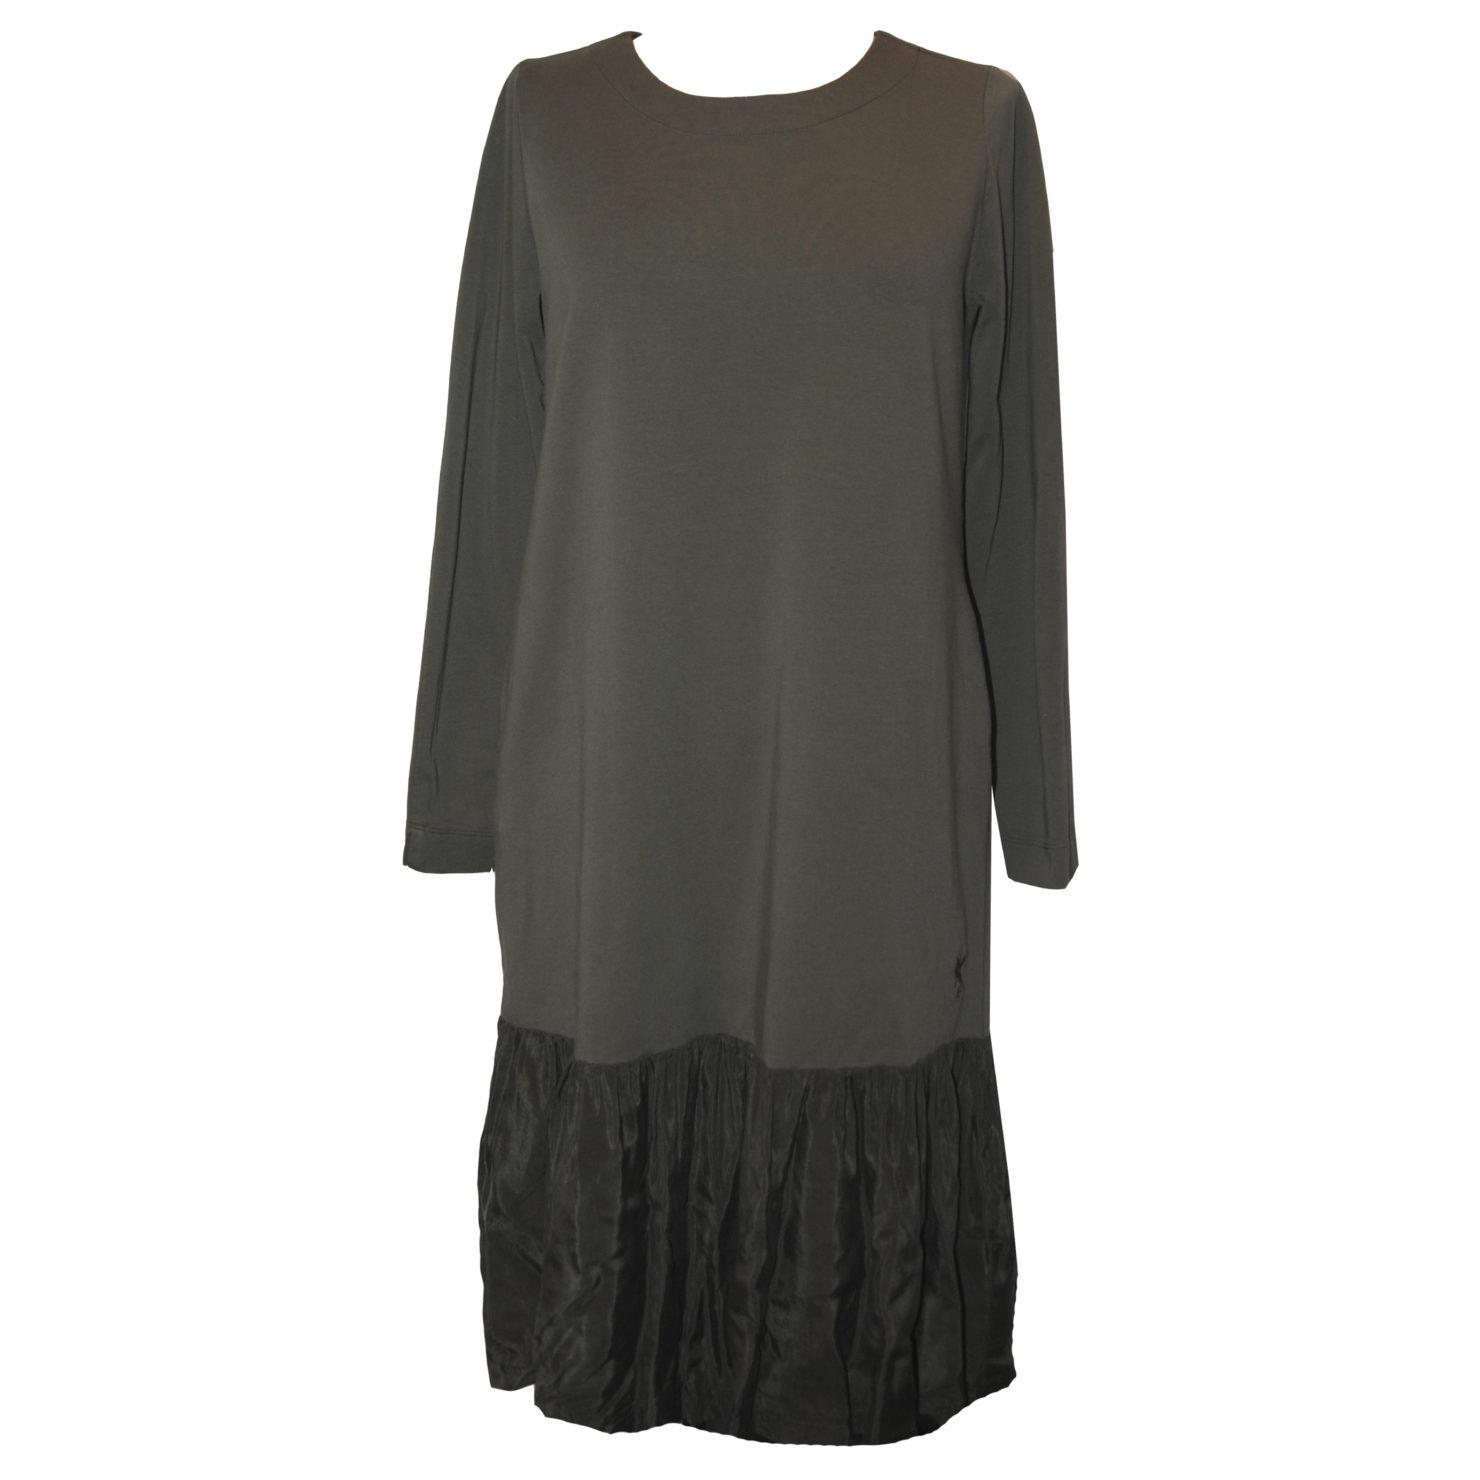 europeanculture | kleid mit volantrock | khaki